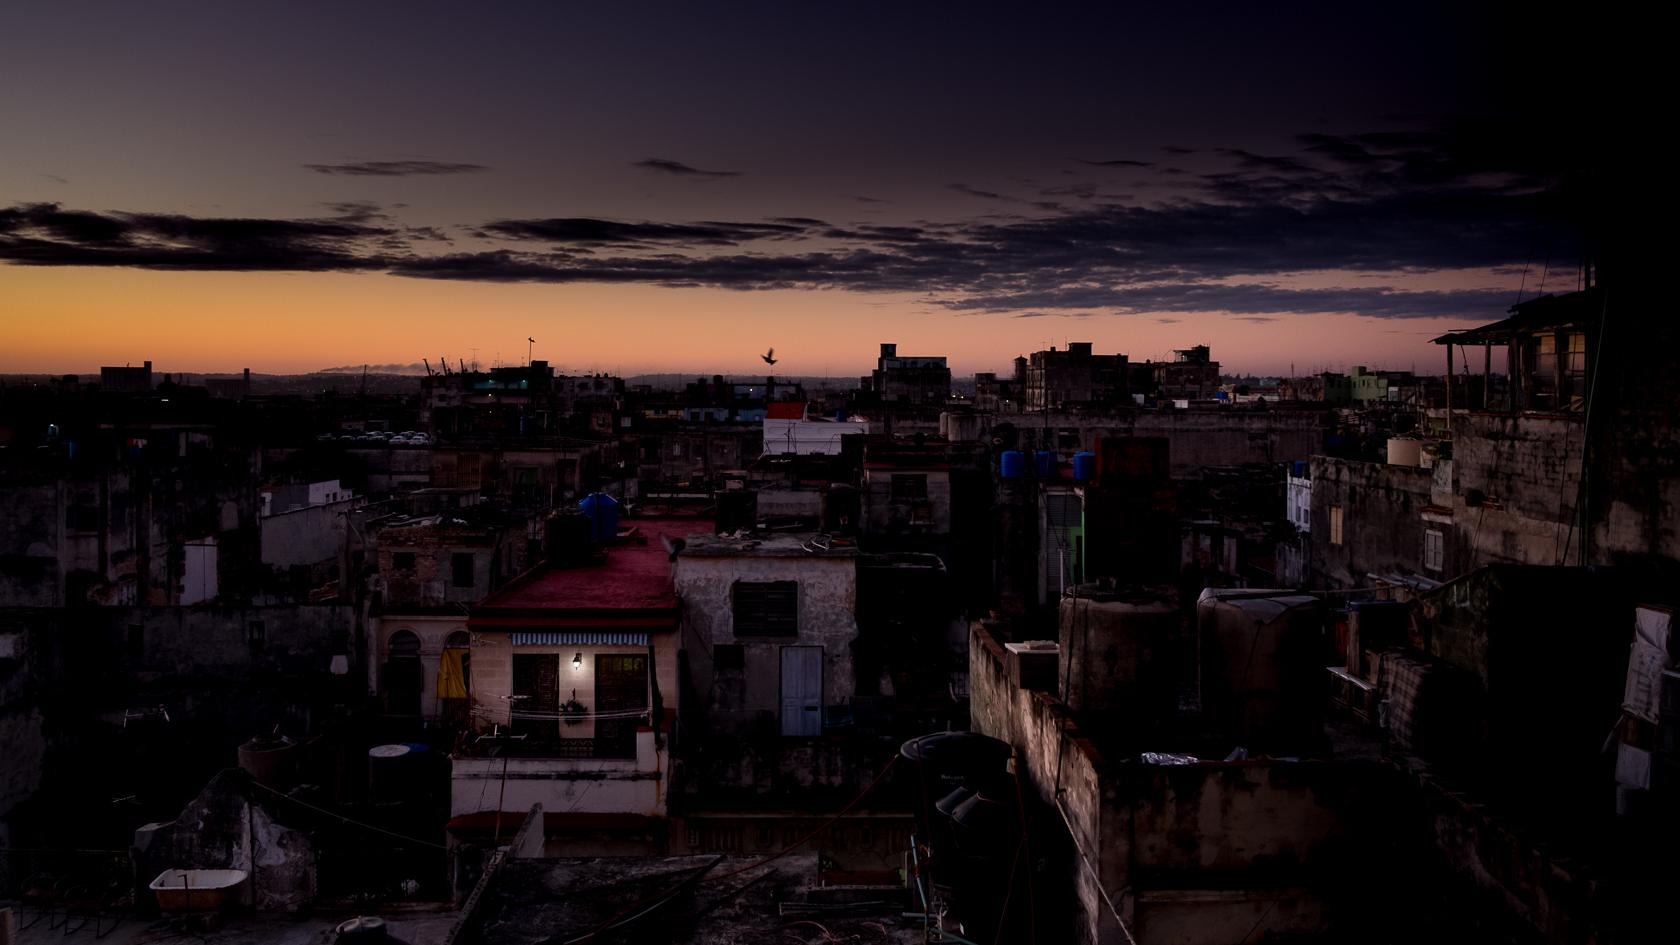 The Ghetto of Havanna